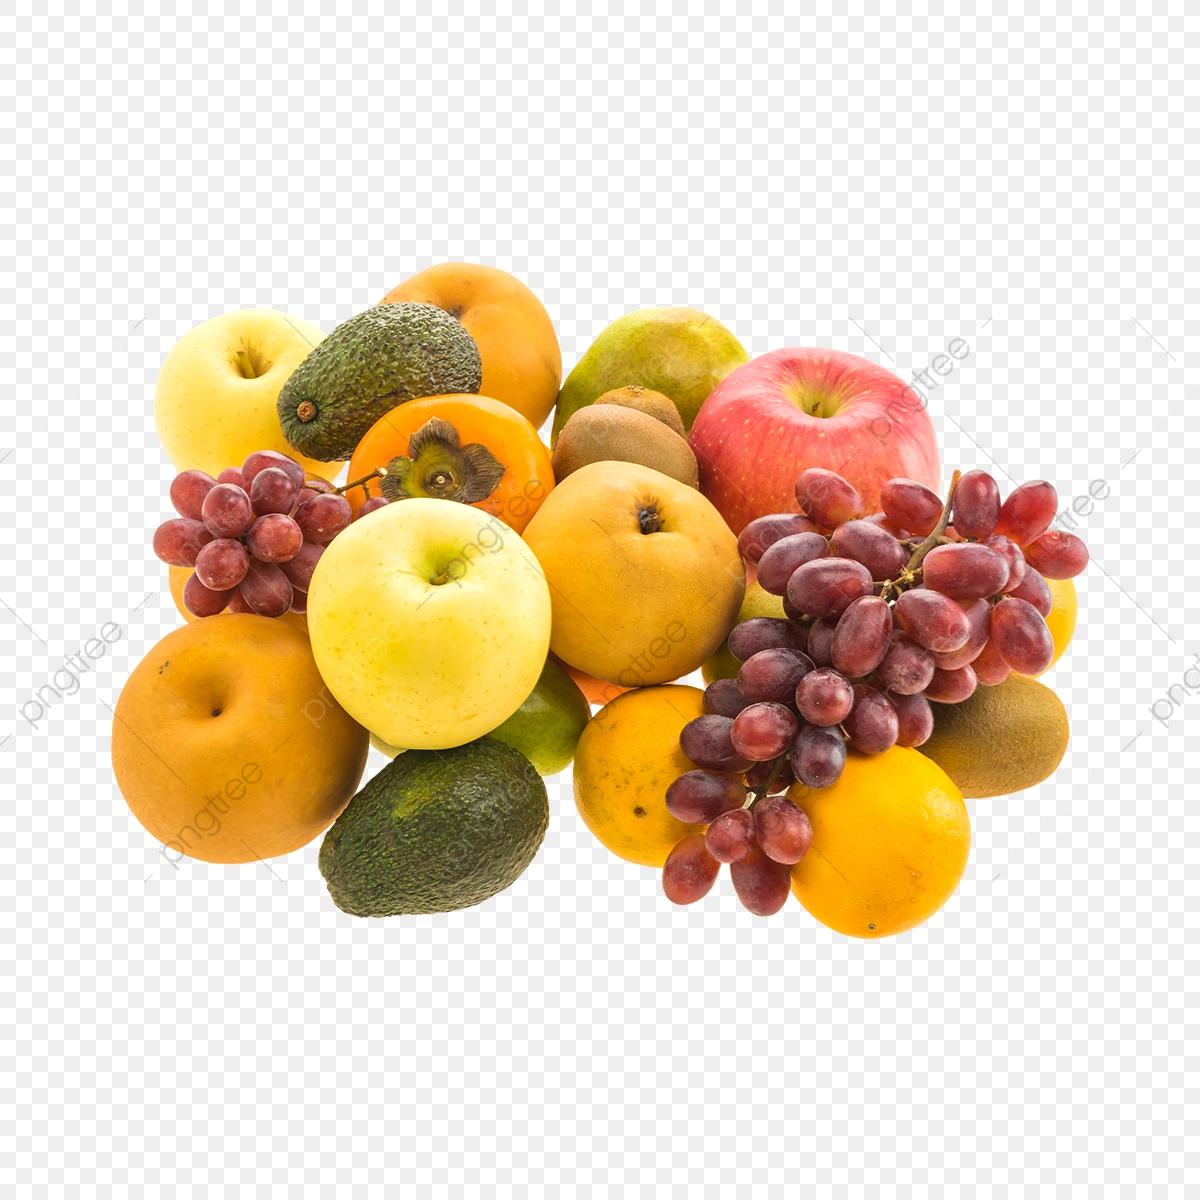 Mixed Fruits Tropical, Png, Cool, Tropic PNG Transparent.